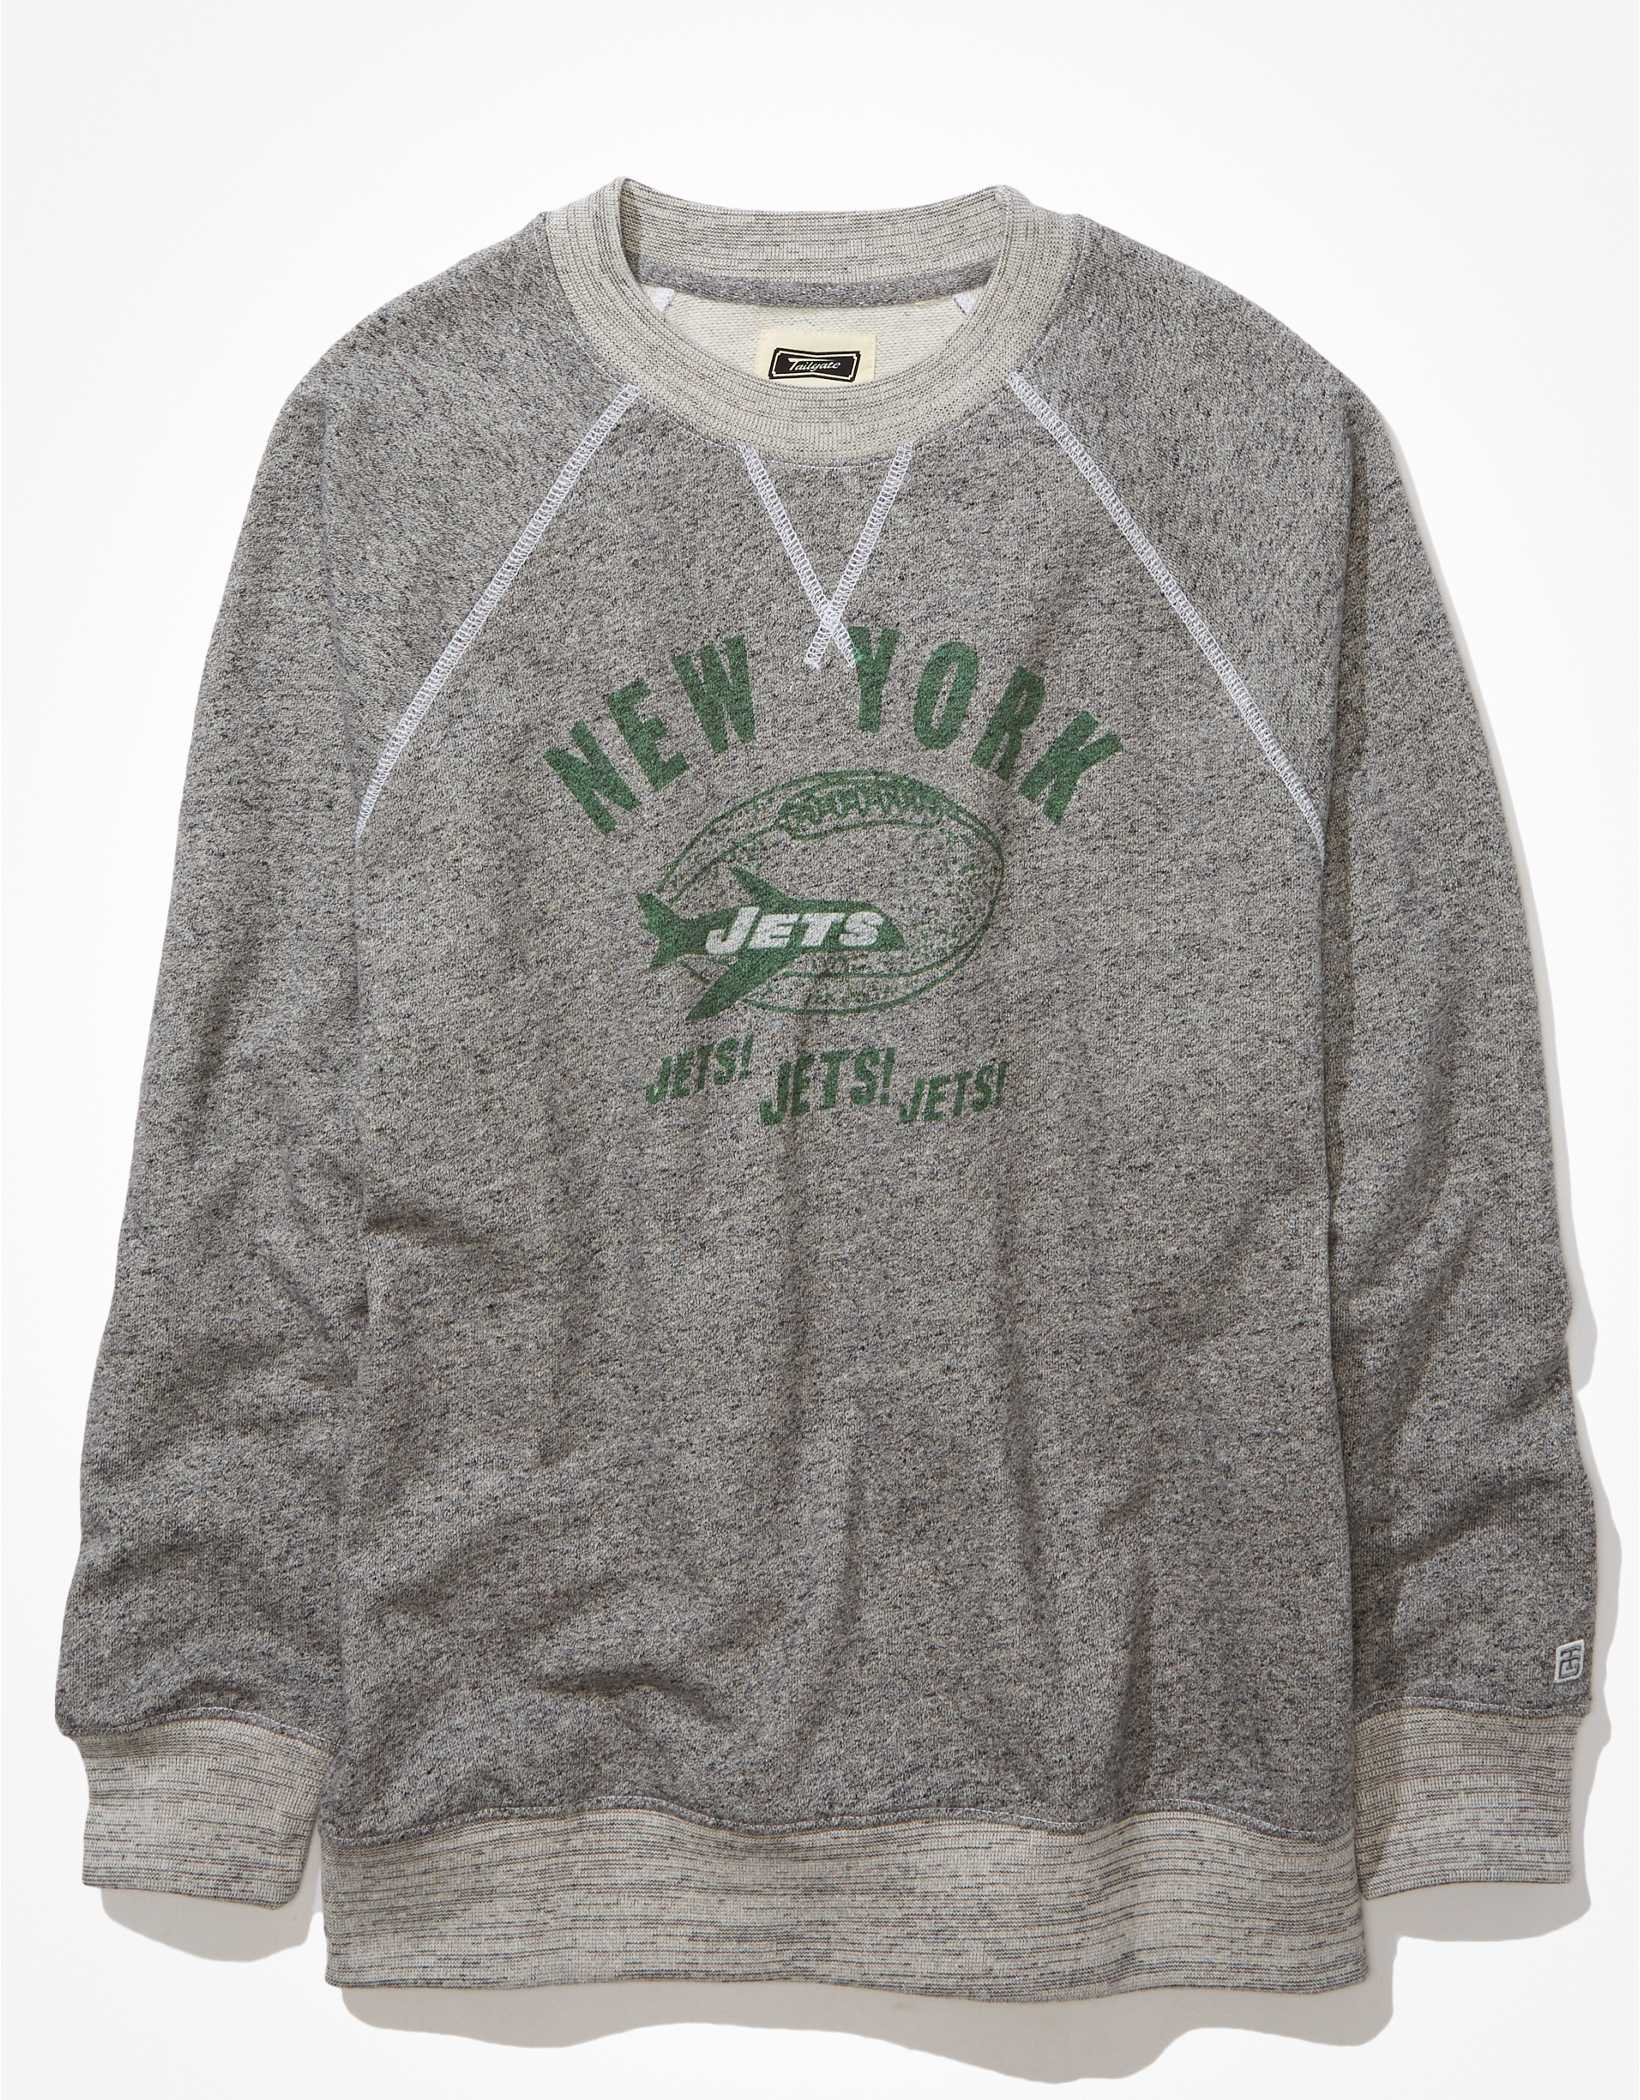 Tailgate Women's New York Jets Oversized Fleece Sweatshirt